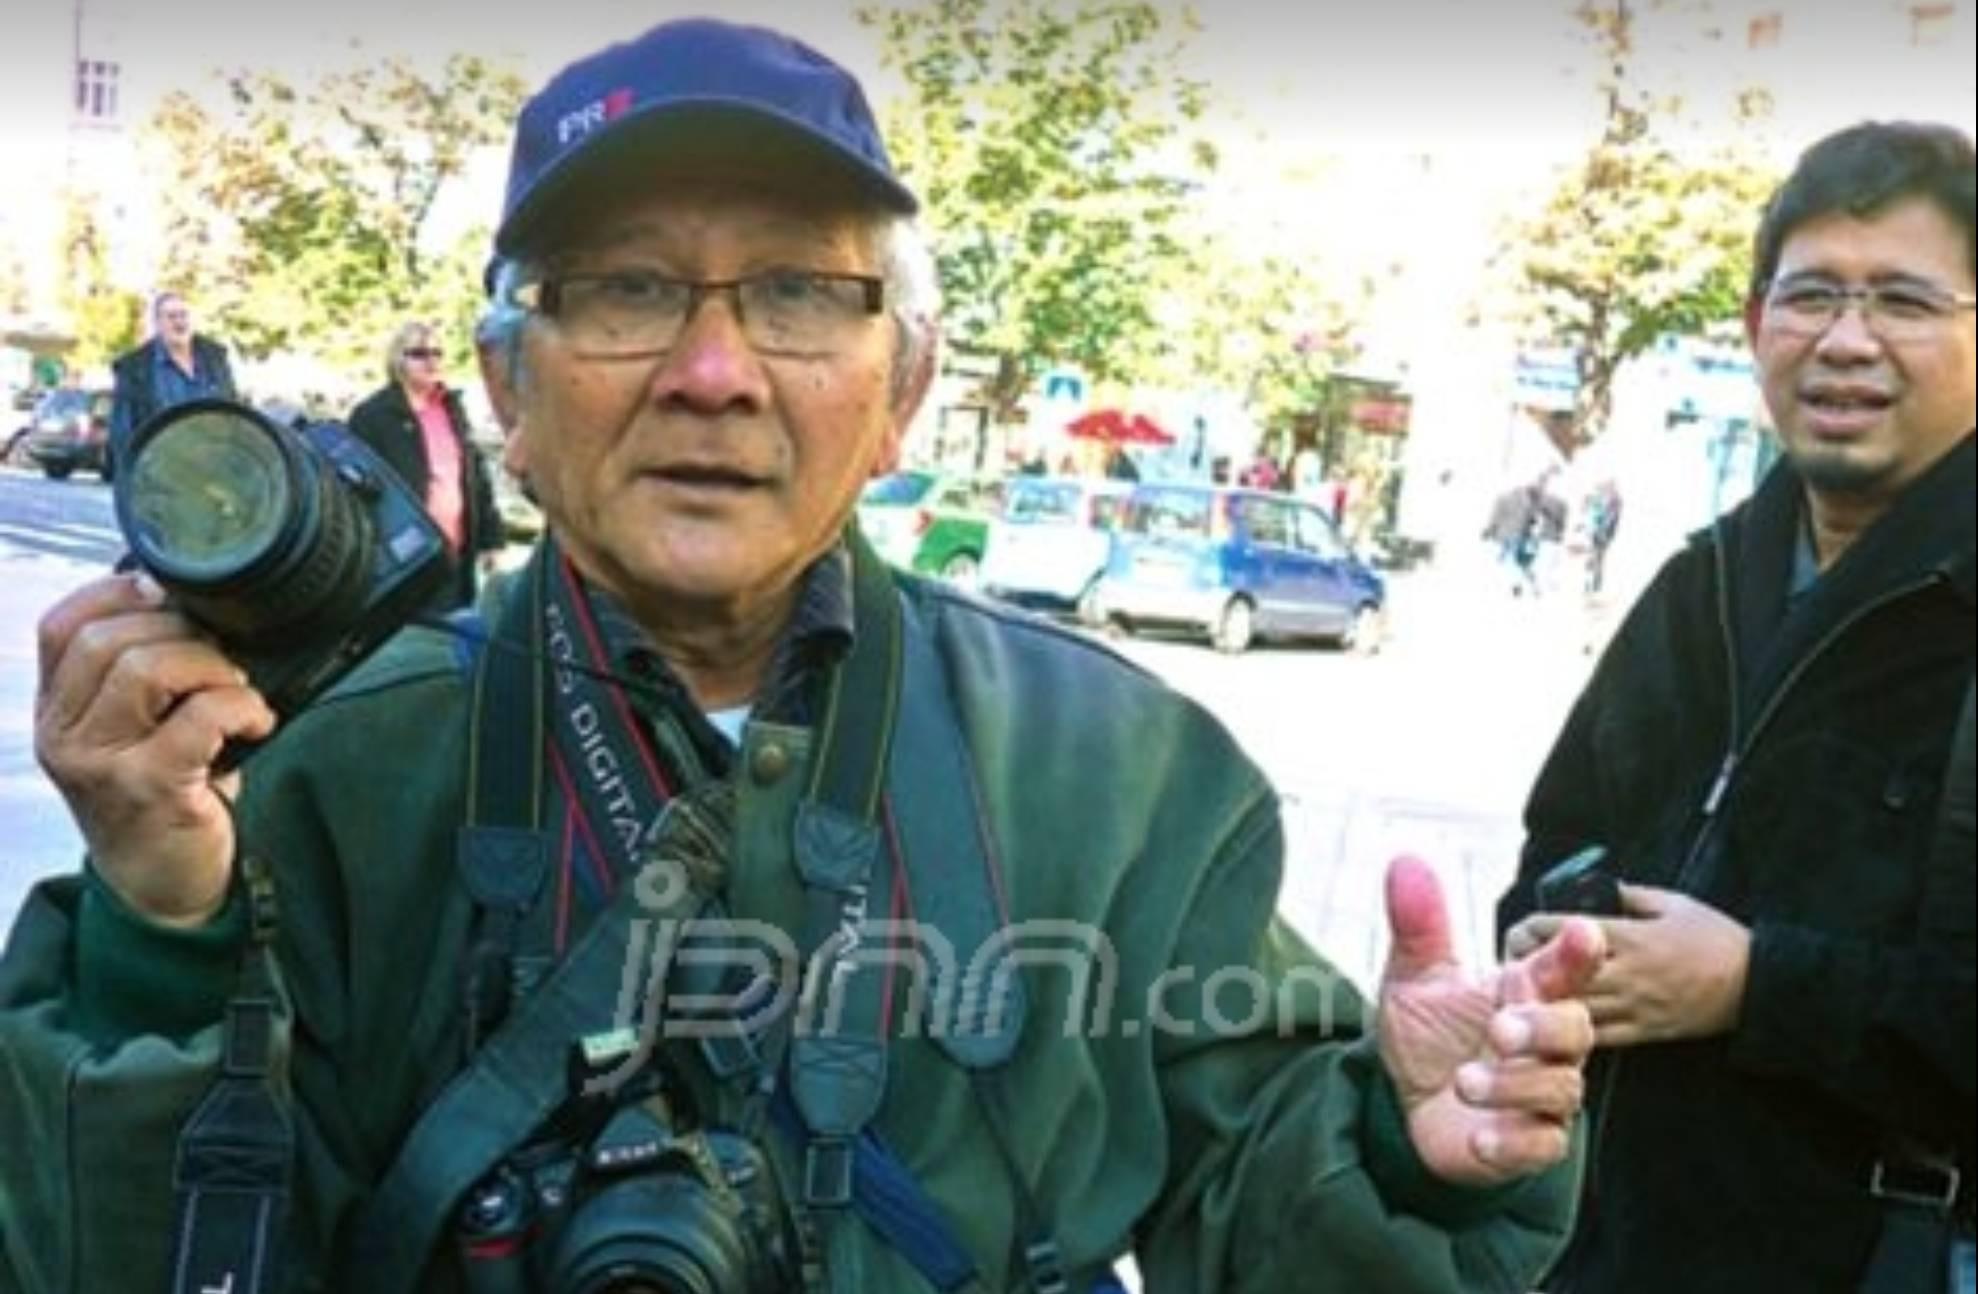 Soegeng Soejono, 48 Tahun Jadi 'Orang Terbuang' di Republik Ceko - JPNN.com